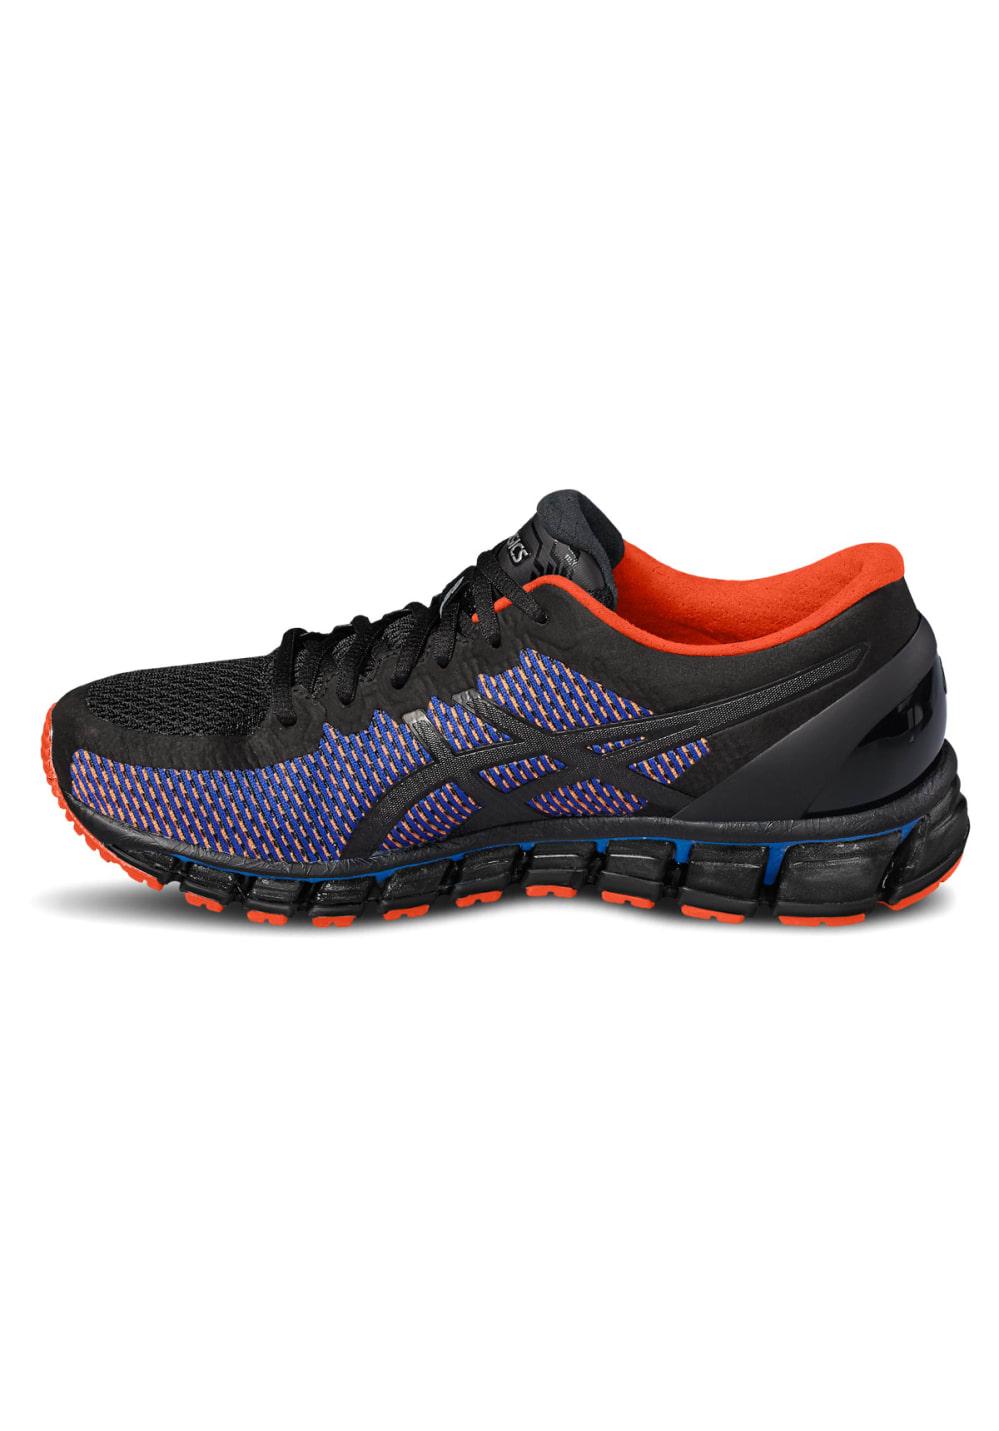 wholesale dealer 92f11 c406b ASICS GEL-Quantum 360 Cm - Running shoes for Men - Black